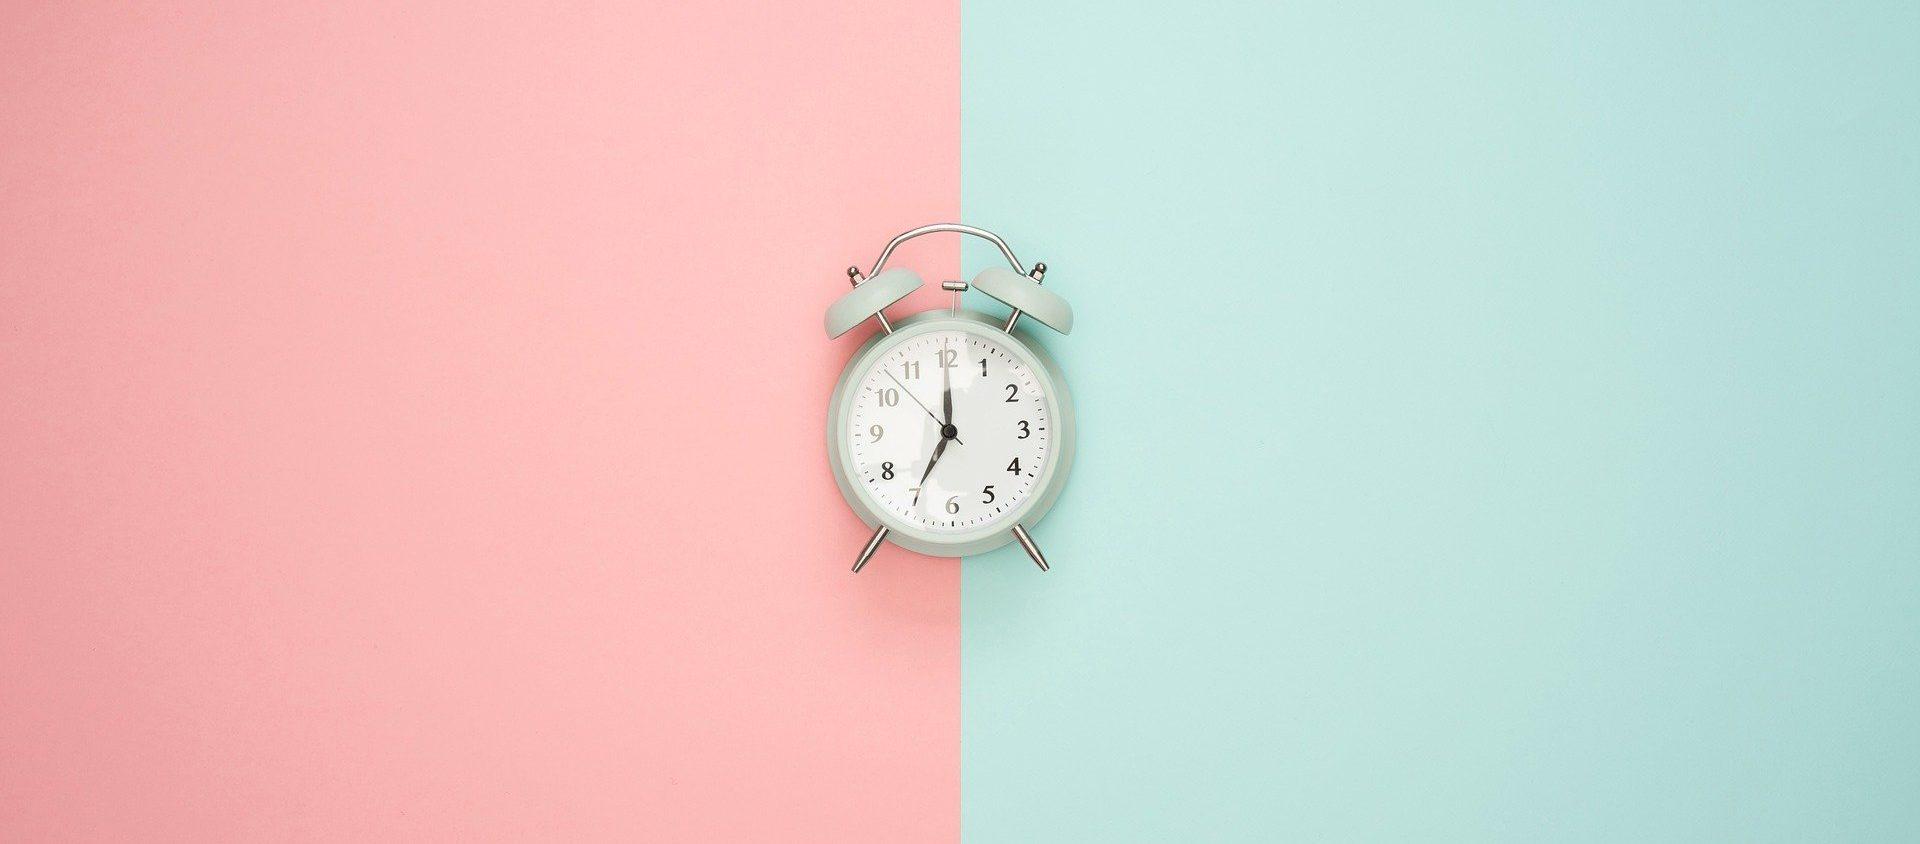 smartdoctor timp organizare